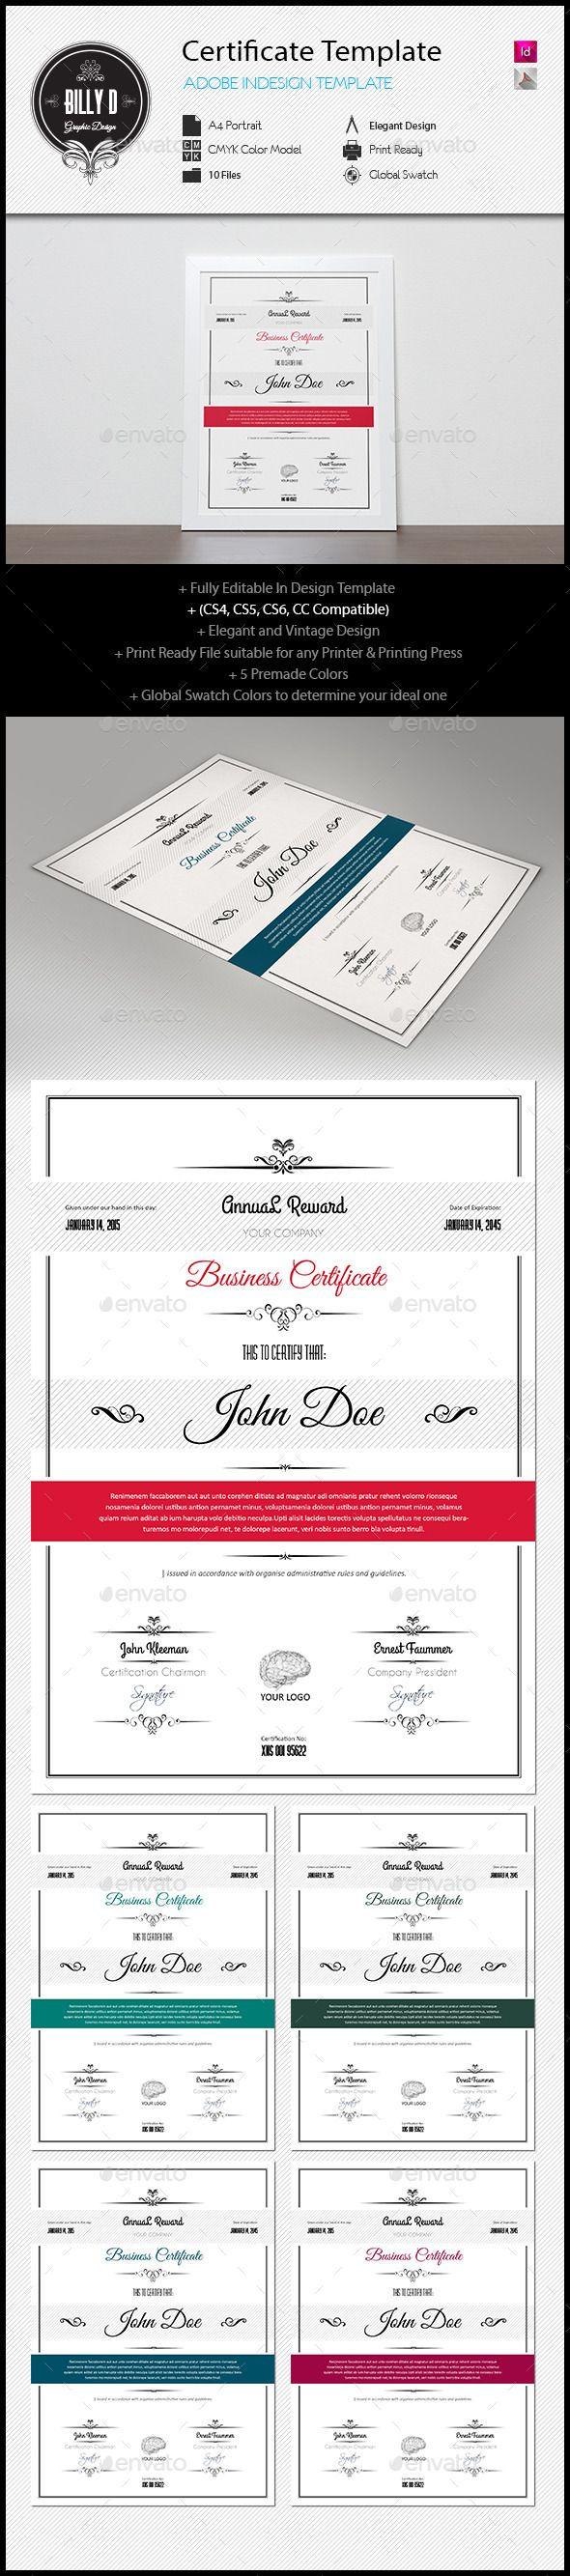 25 unique certificate templates ideas on pinterest free certificate template yadclub Images